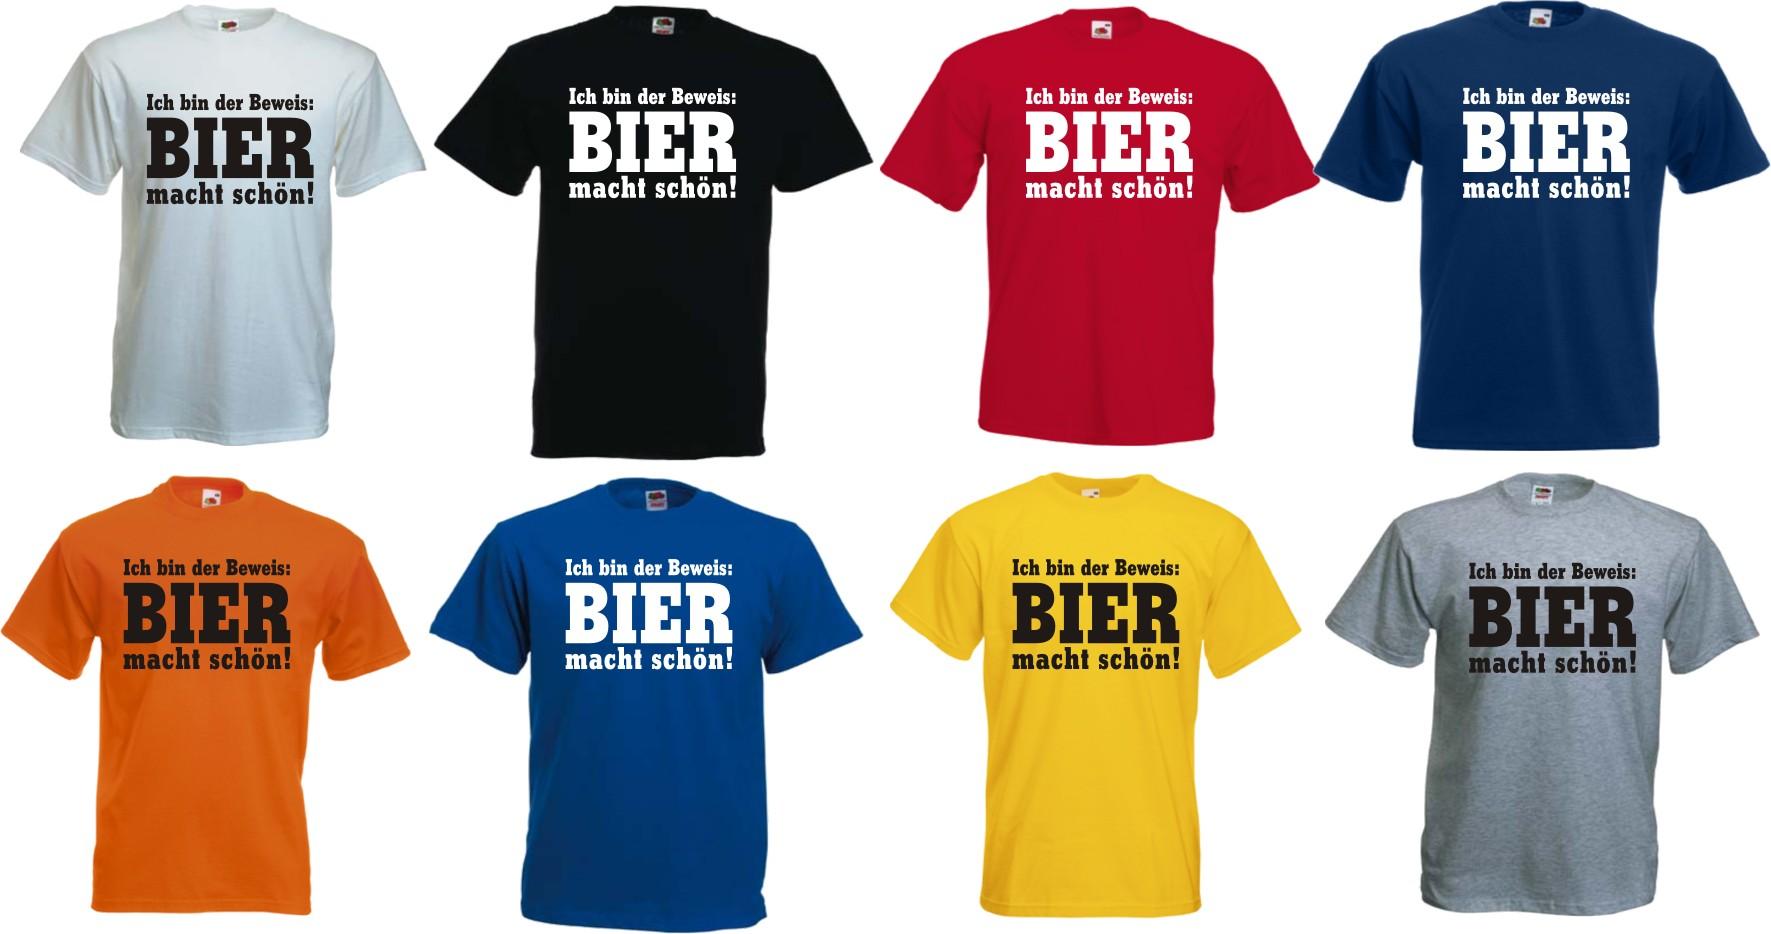 Bier_beweis_alle_farben.jpg